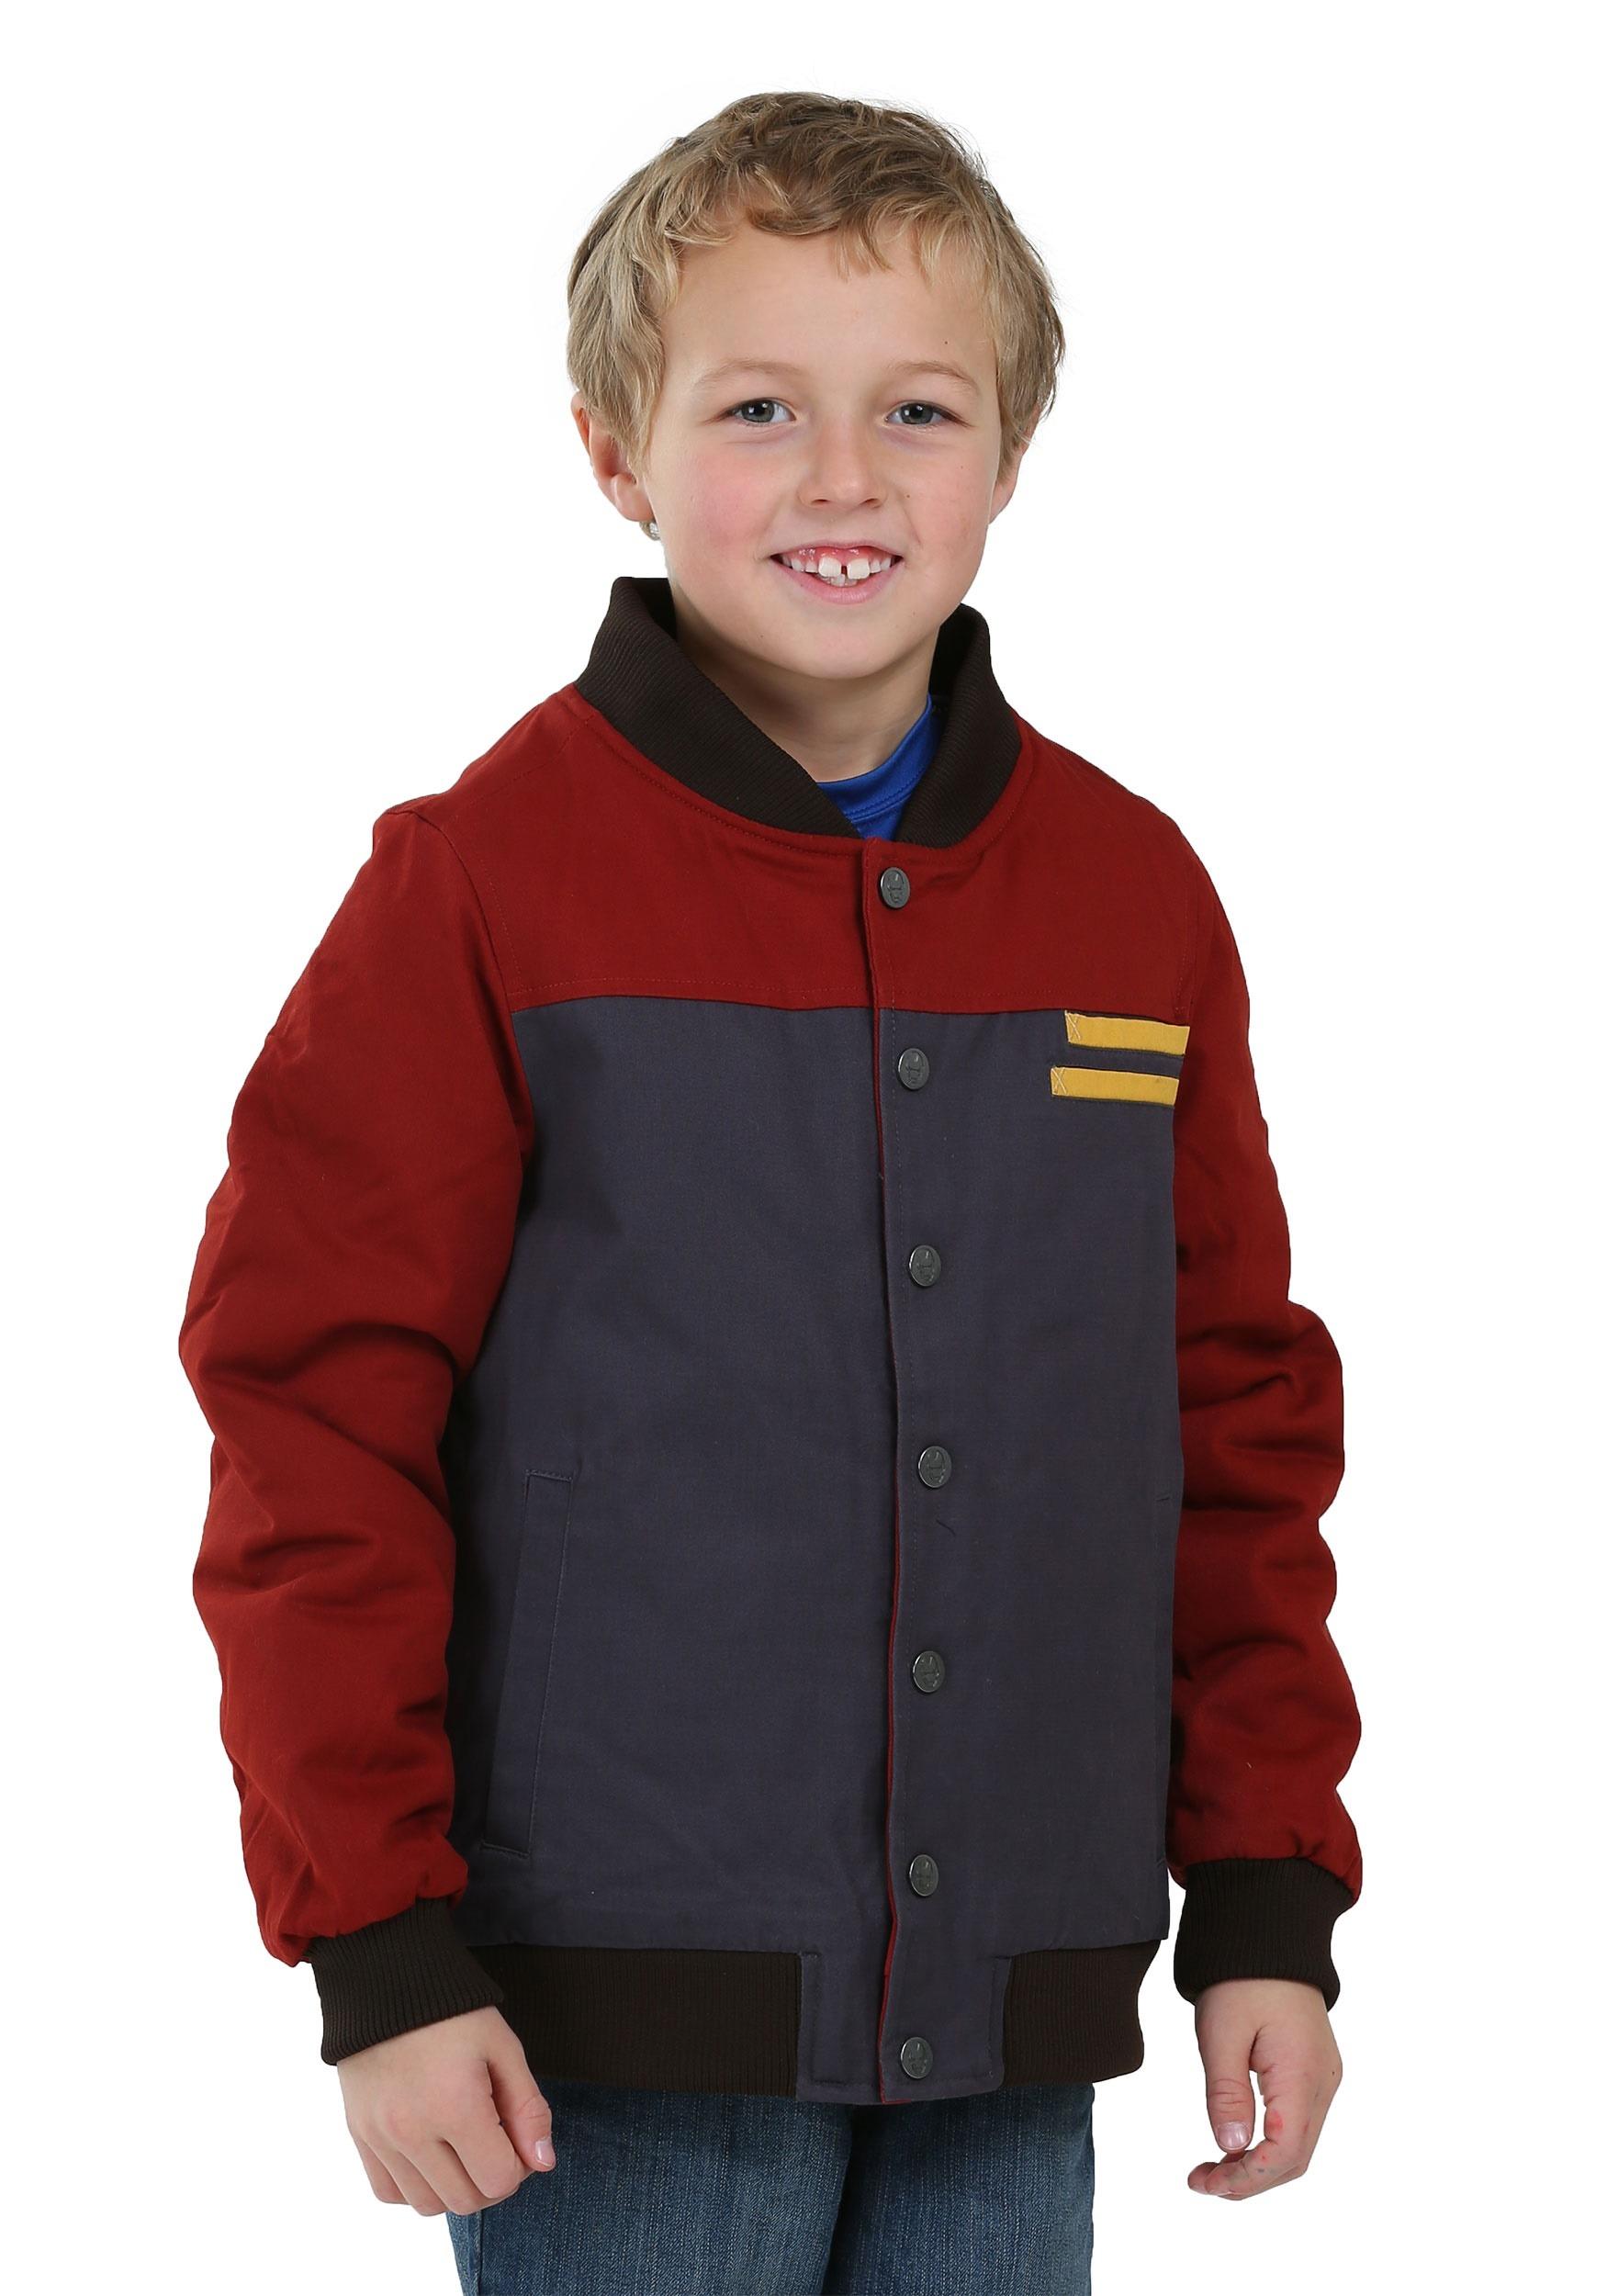 Kids Iron Man Casual Superhero Jacket (Secret Identity)